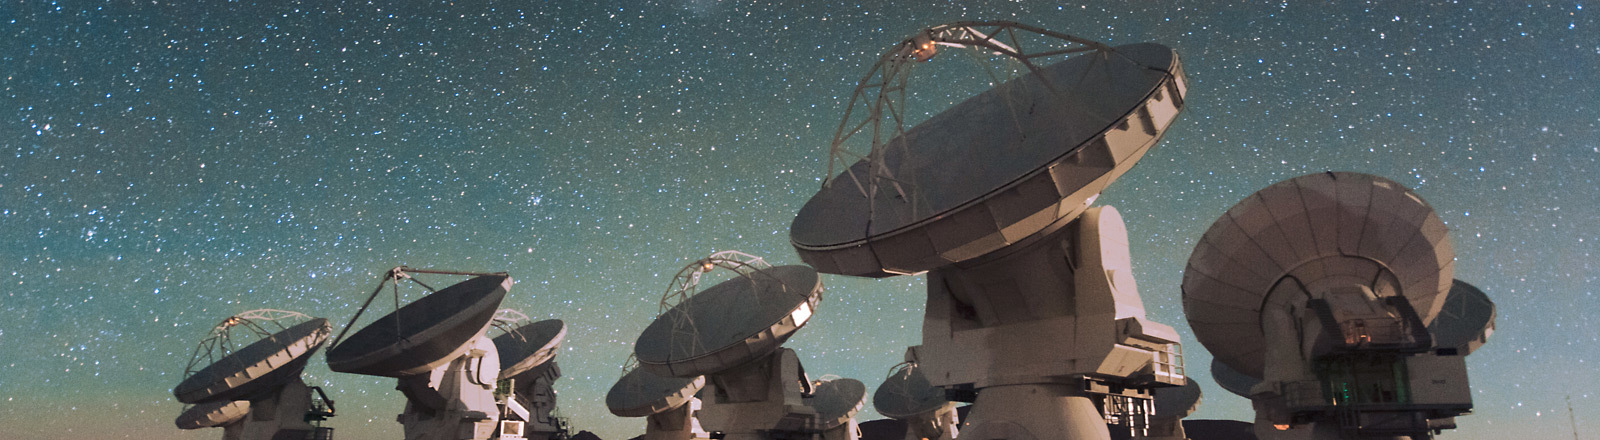 Alma-Observatorium in der Atacama-Wüste.